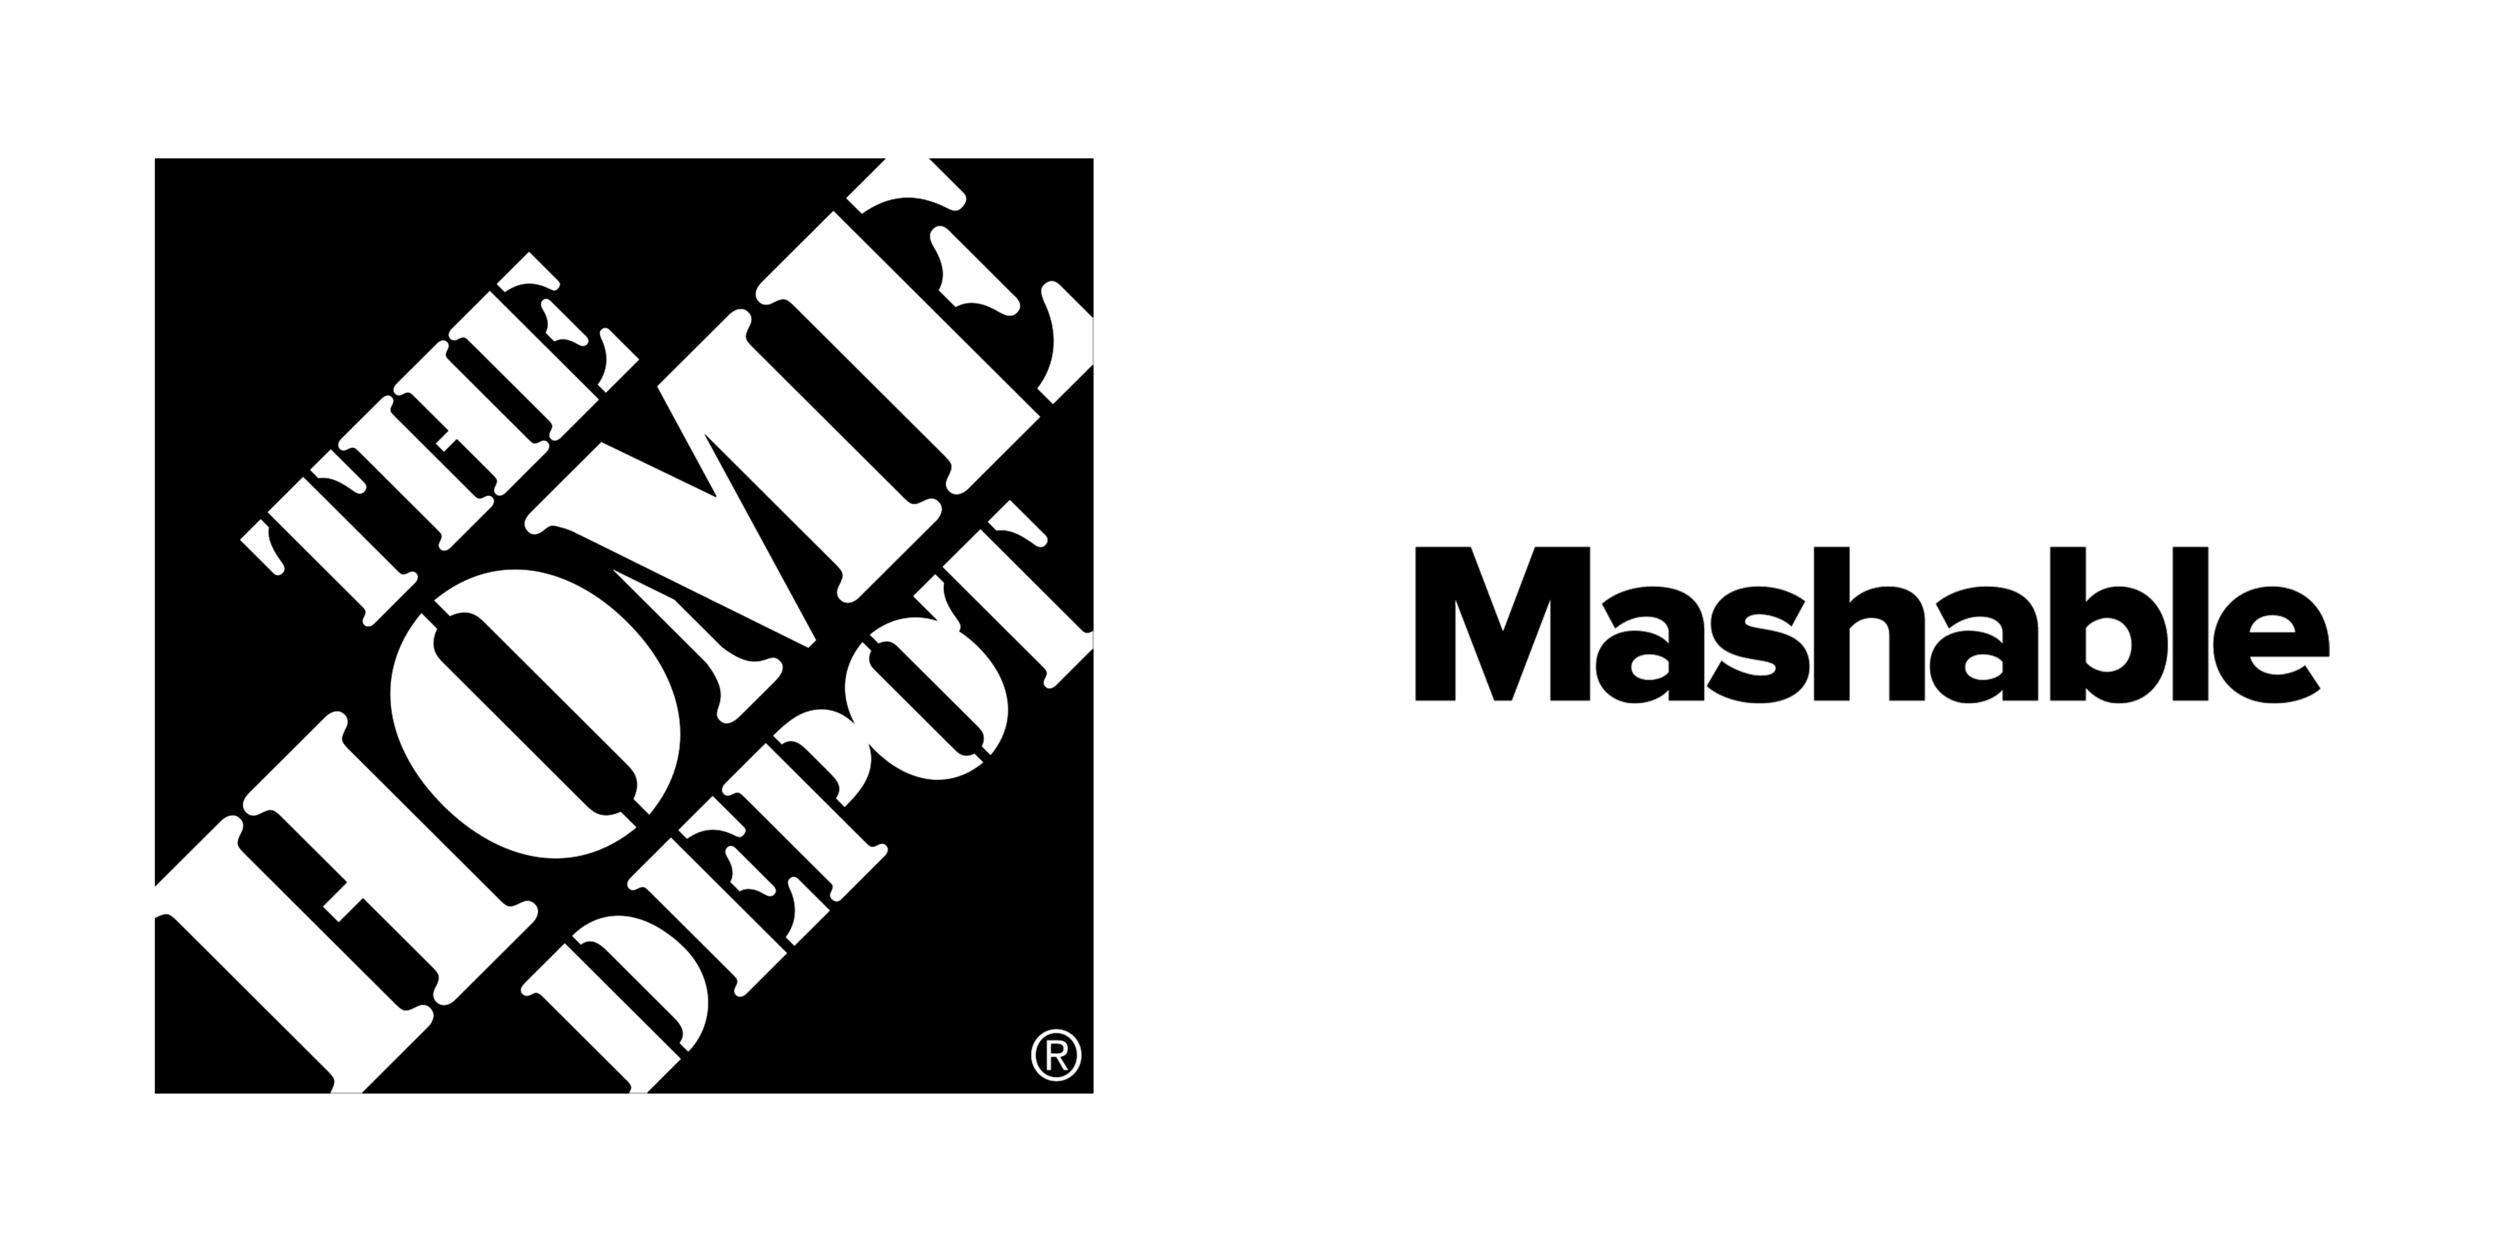 Home Depot + Mashable.png